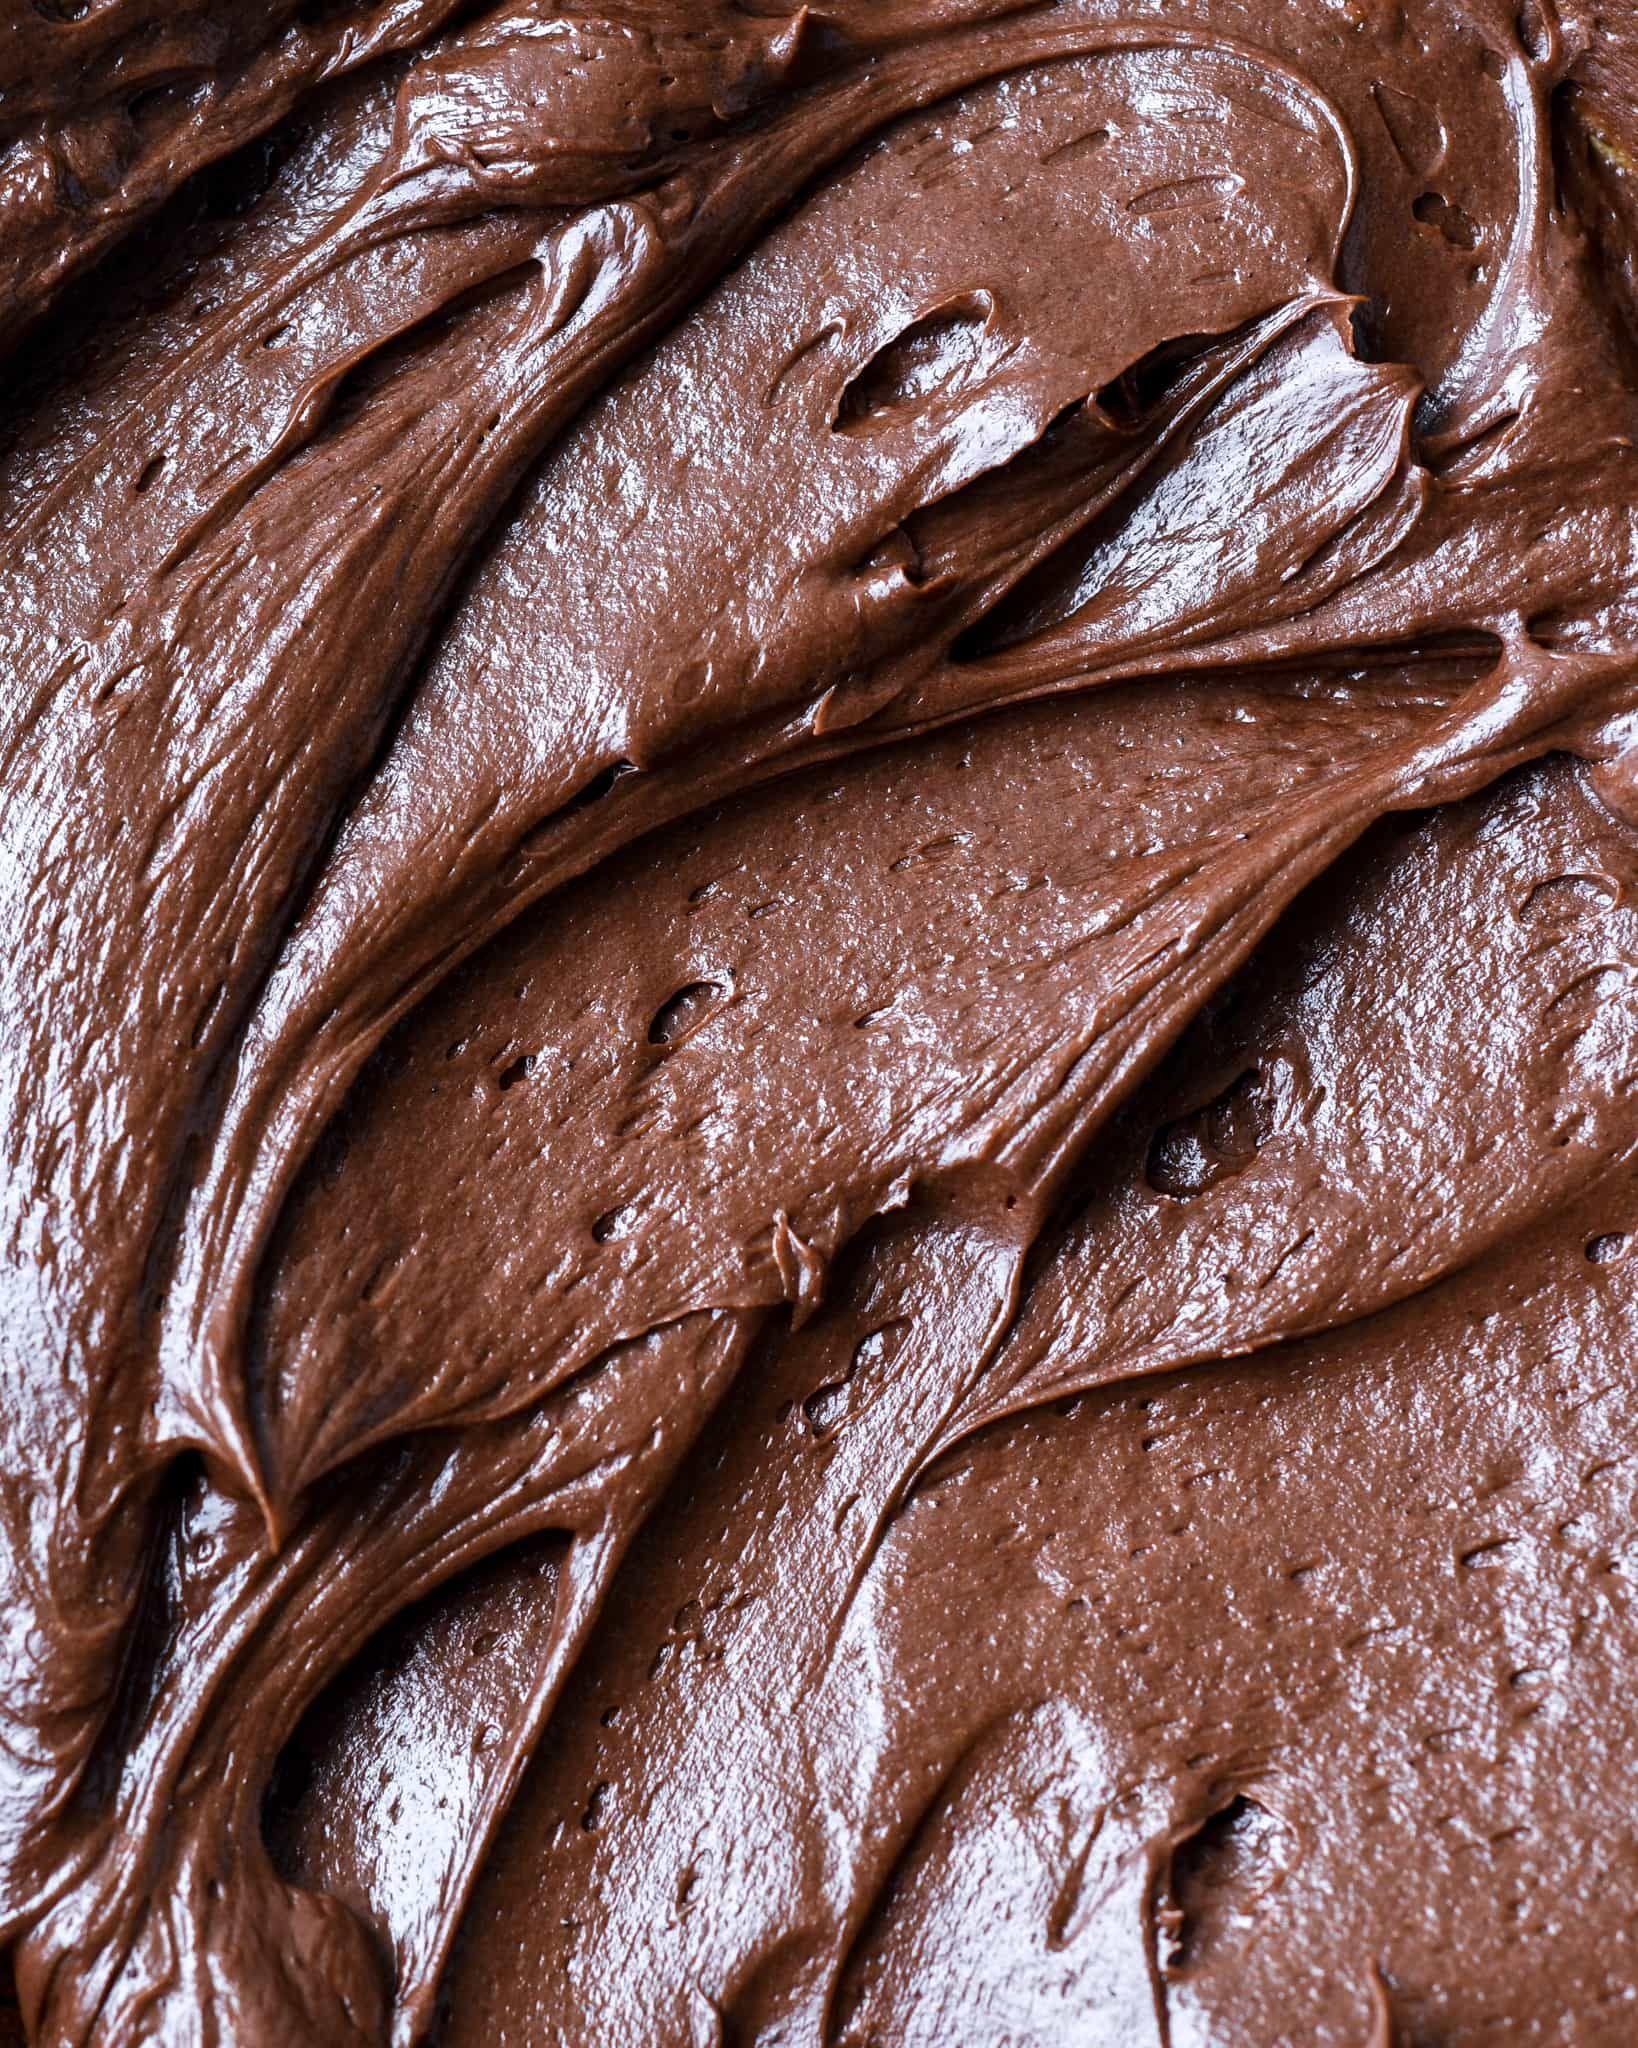 How To Make Perfect American Buttercream Buttermilk By Sam Recipe In 2020 Butter Cream Chocolate Mascarpone